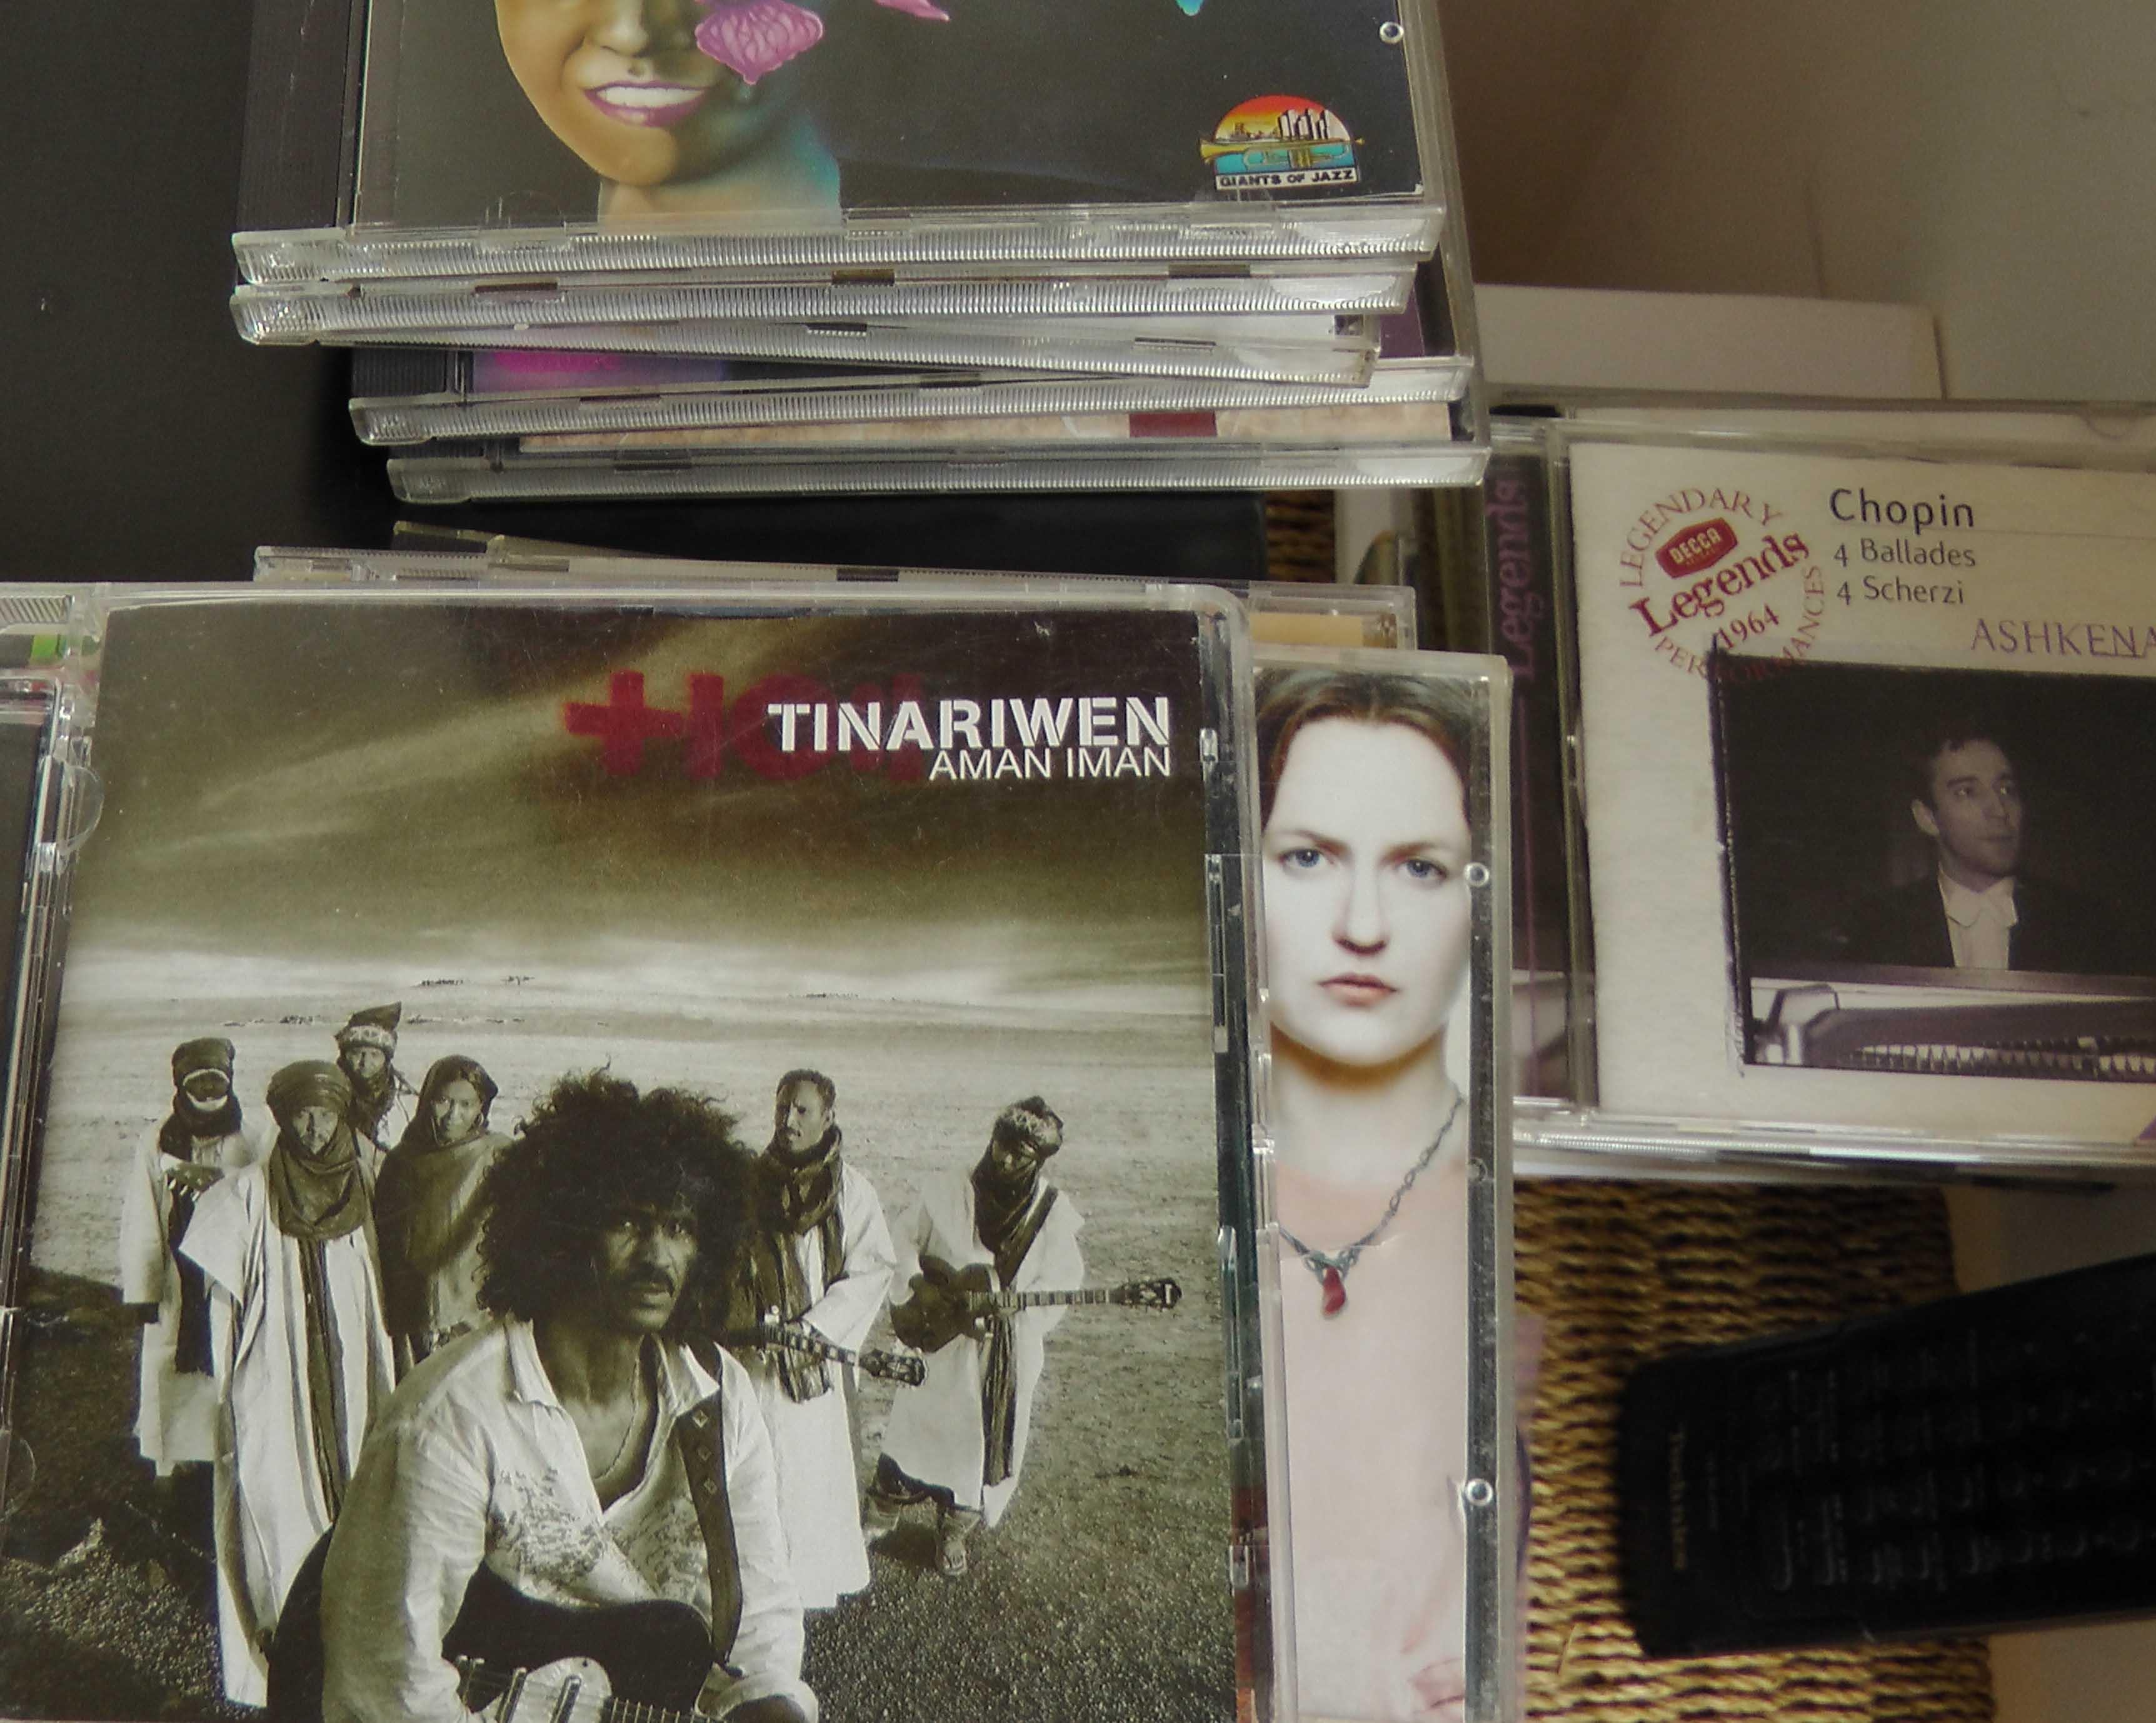 Tinariwen, Aman Iman, album recommandé par Rachel Silski, vagabondssanstreves.com